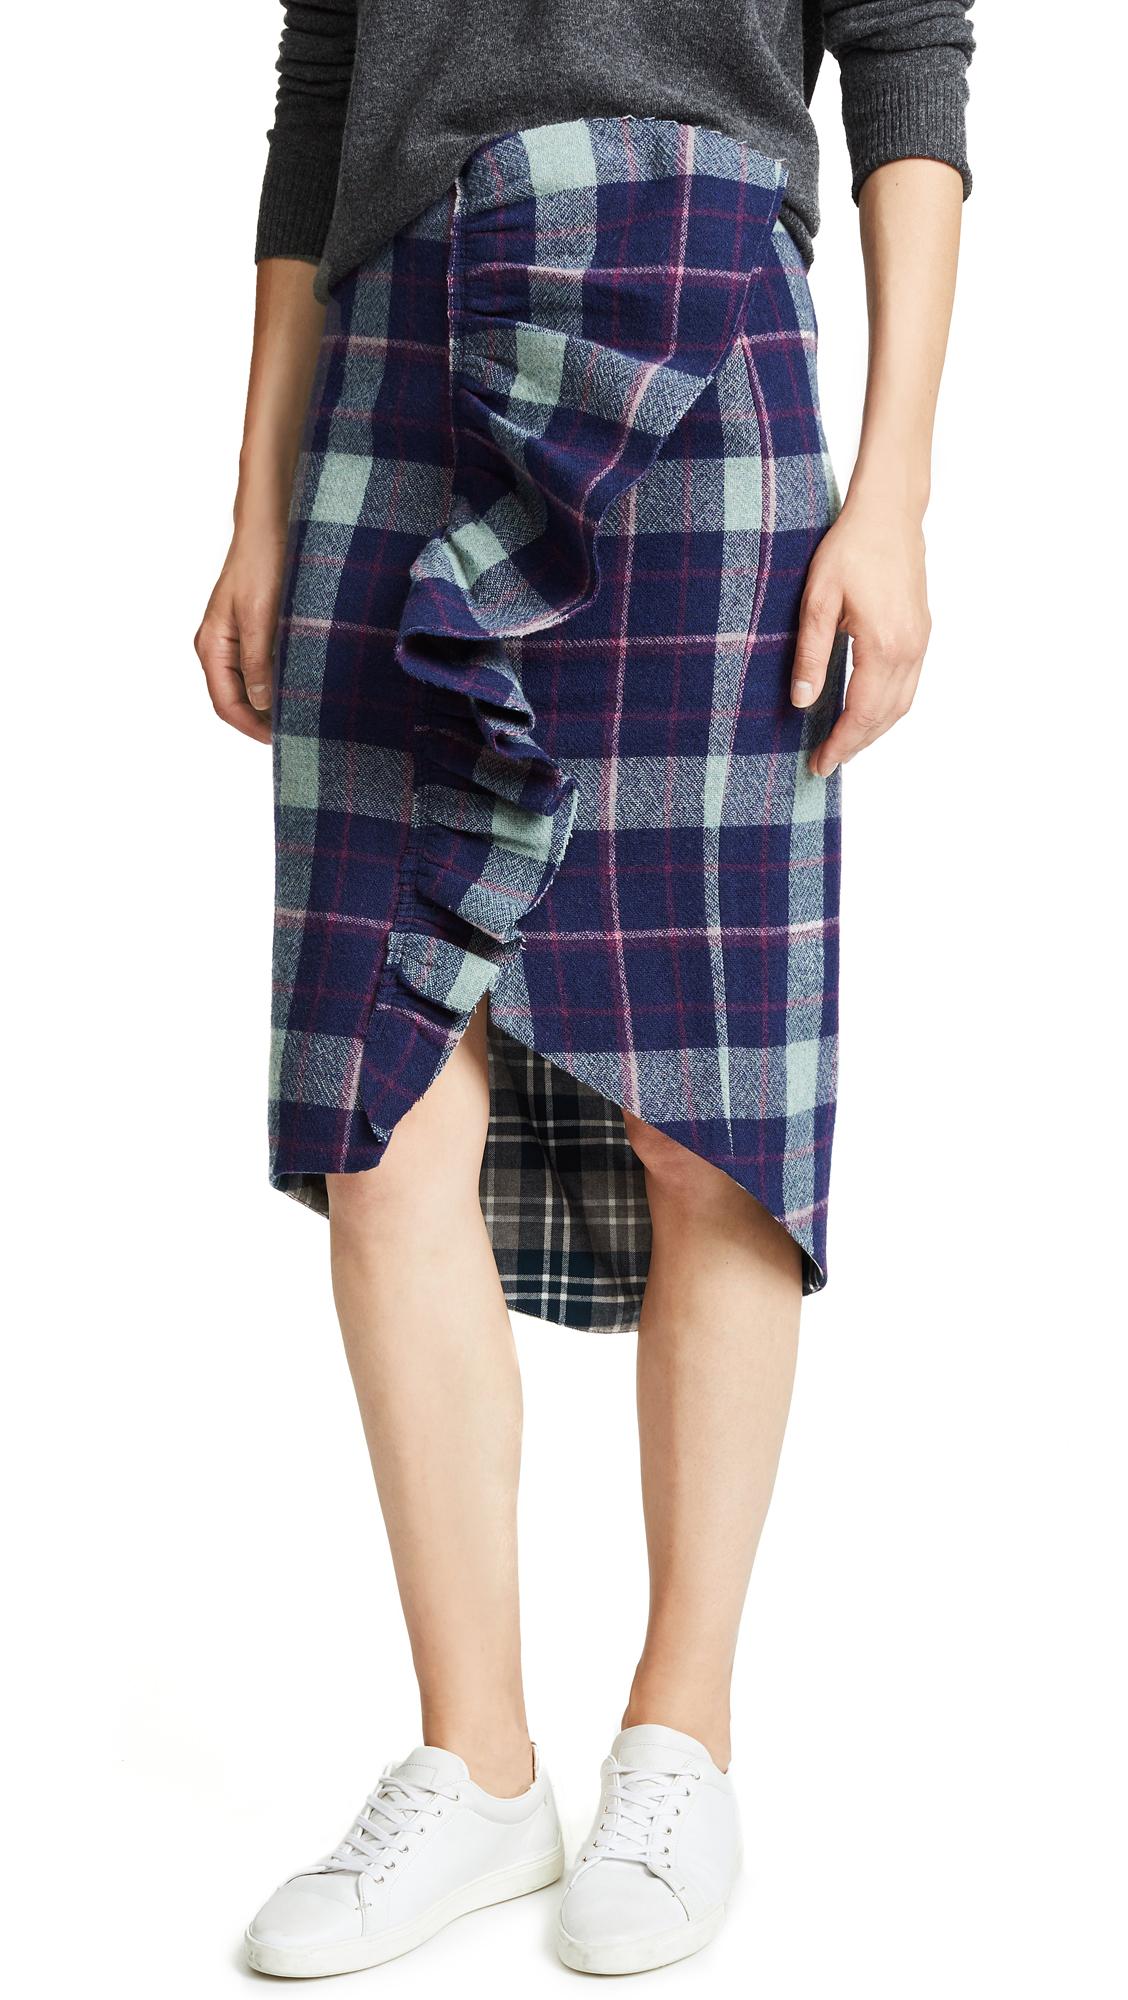 Natasha Zinko Plaid Frilled Pencil Skirt In Navy